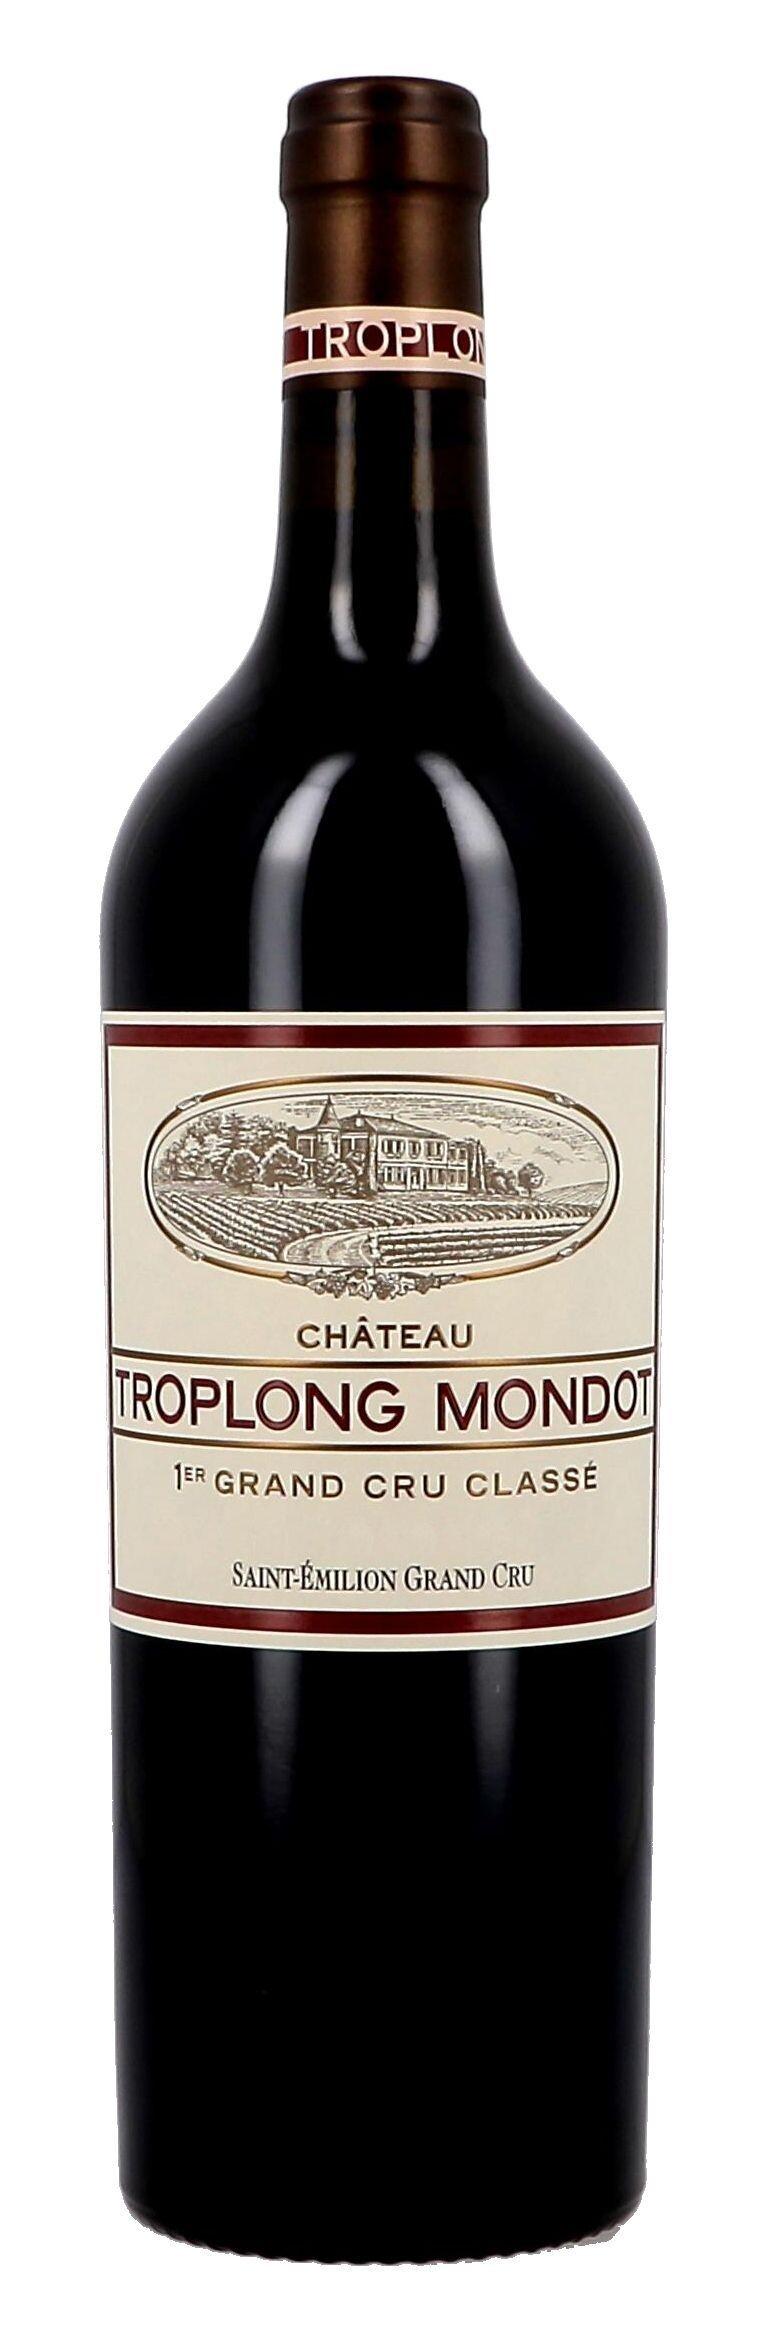 Chateau Troplong-Mondot 75cl 2017 St.Emilion 1er Grand Cru Classe (Wijnen)